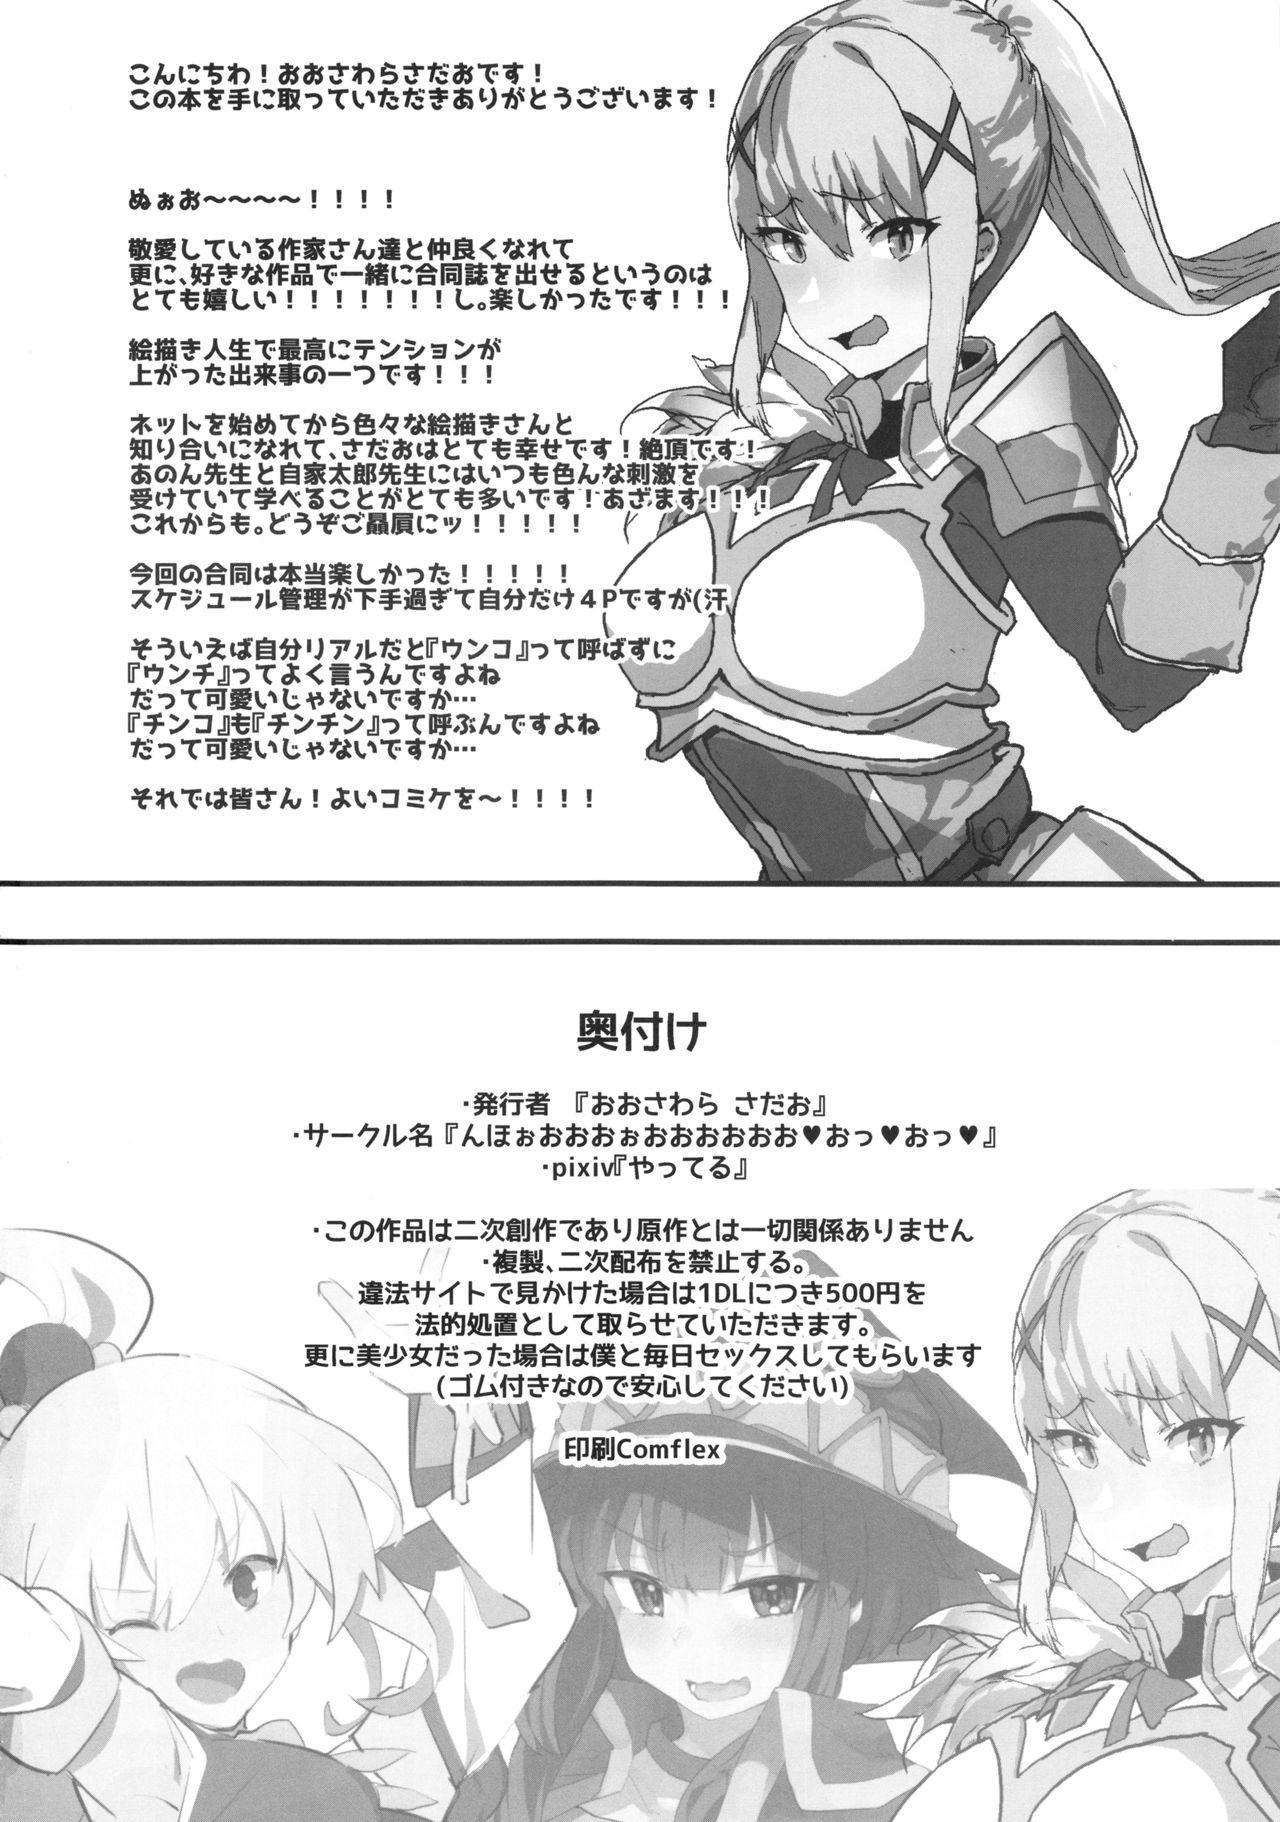 KonoSuba Goudoushi! | Combined Konosuba Book 19